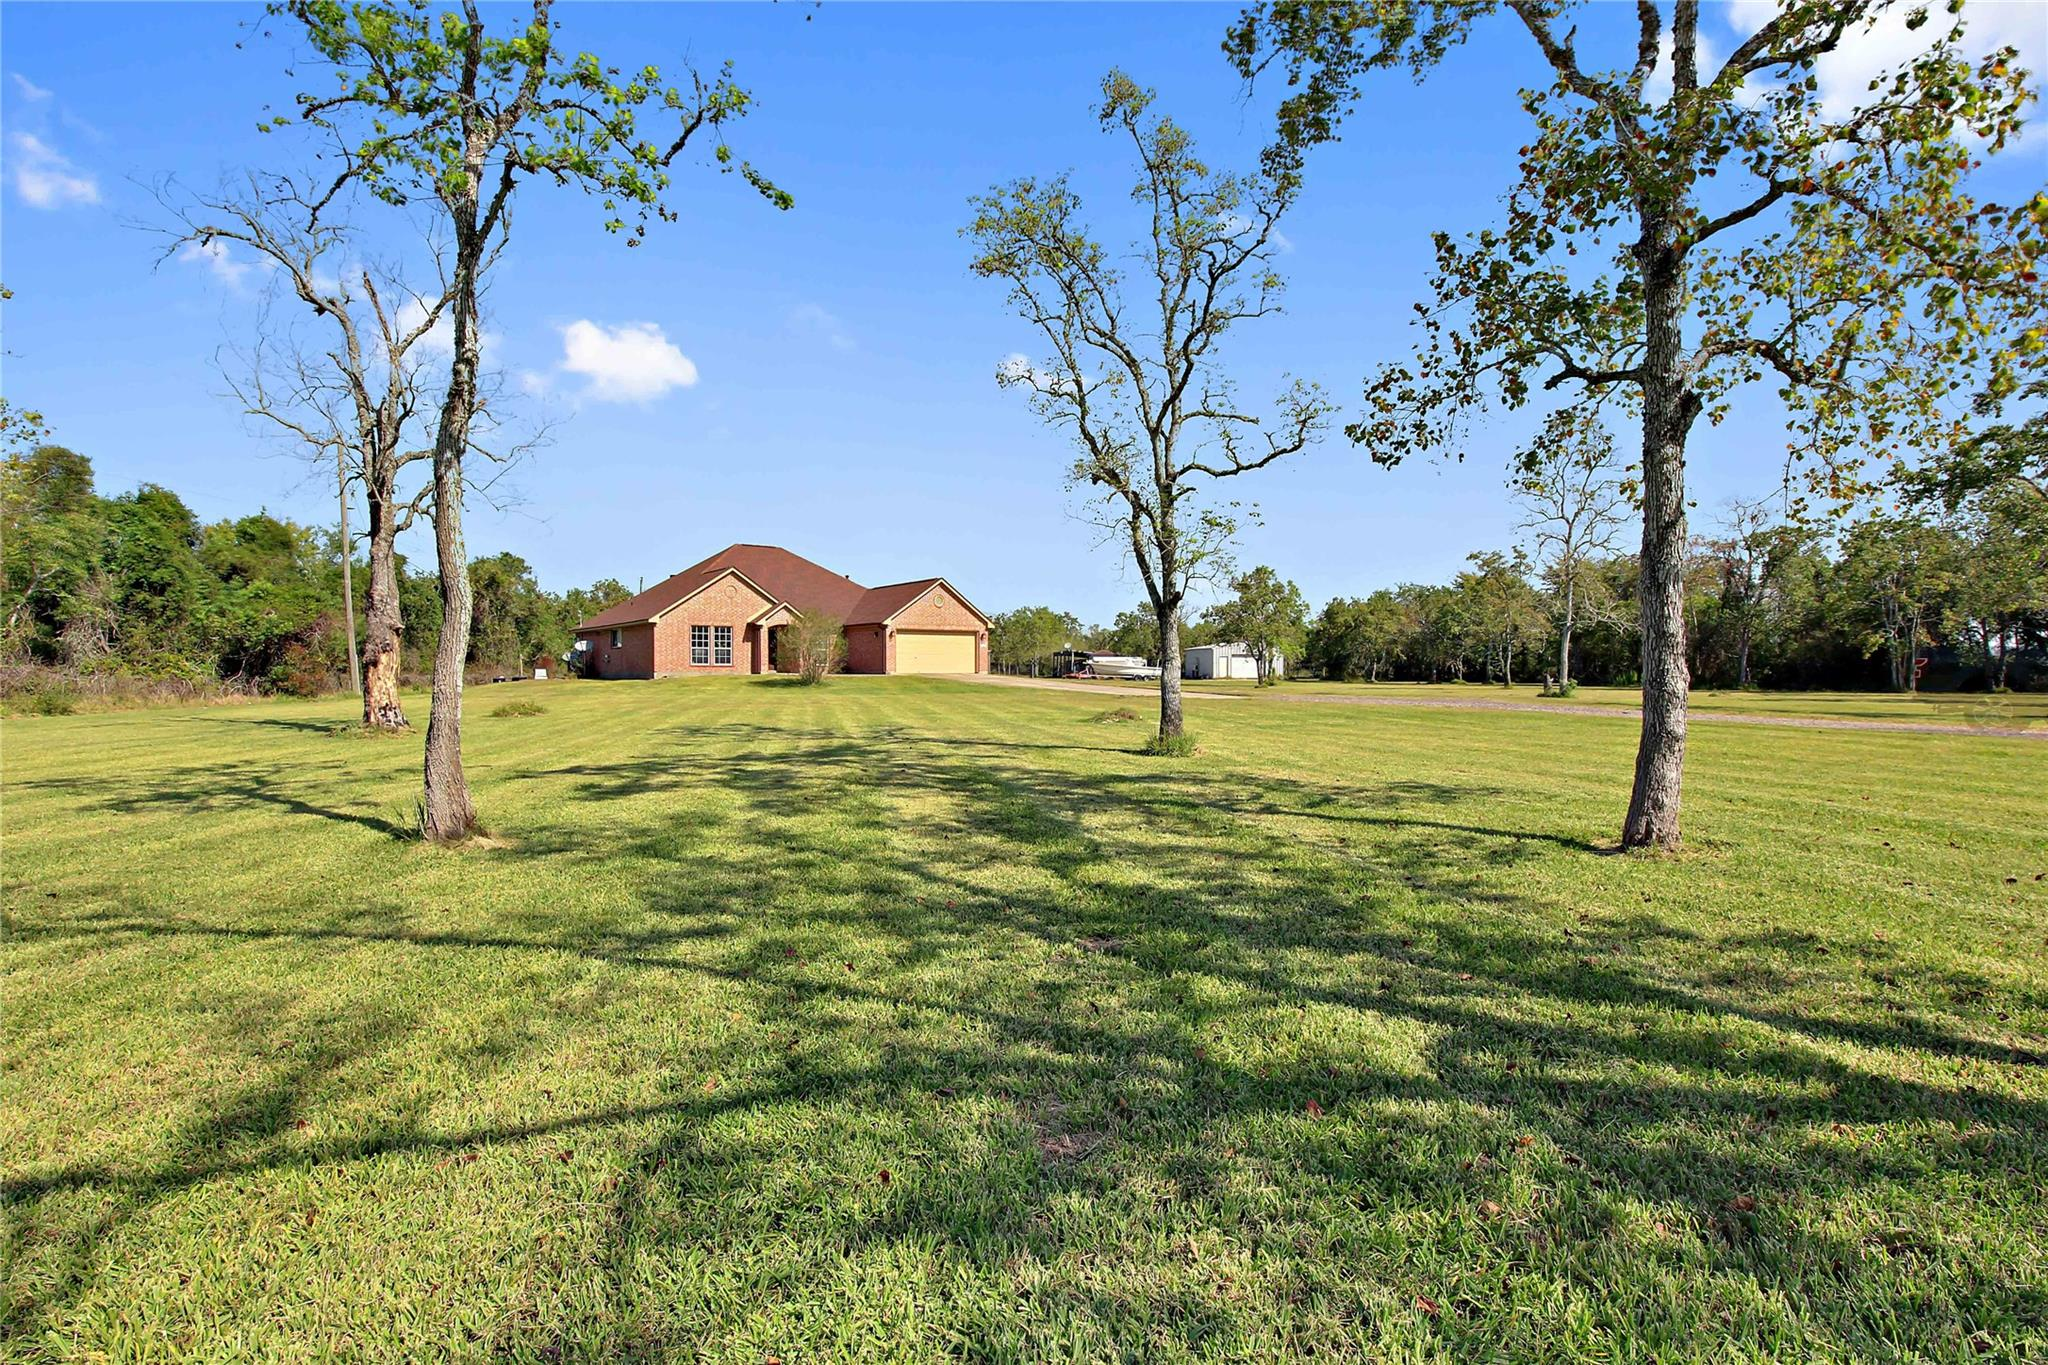 8686 Fm 2004 Road Property Photo - Santa Fe, TX real estate listing